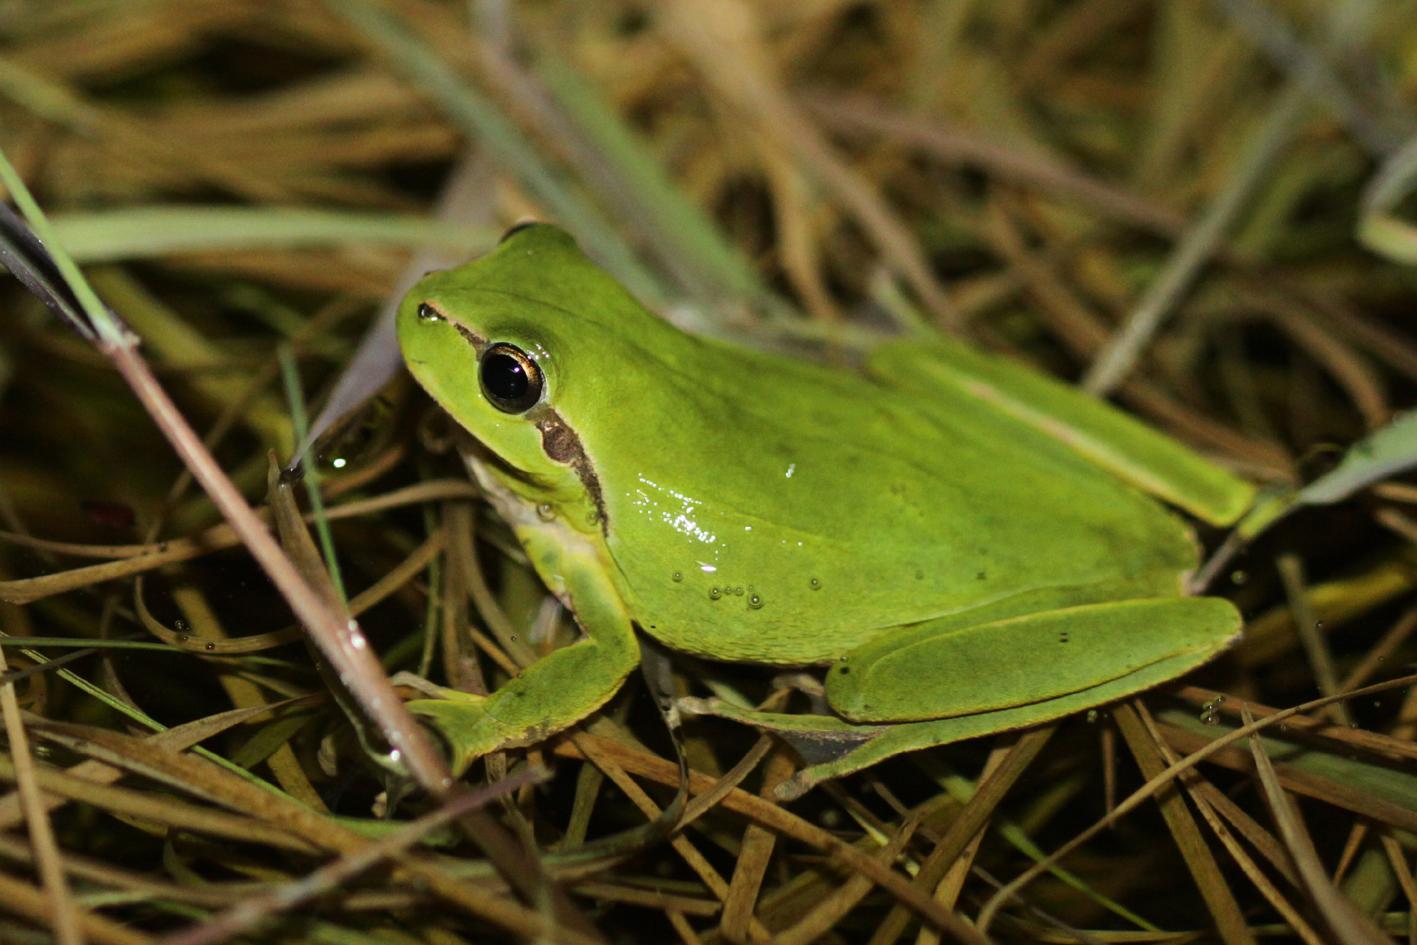 https://cdnfiles1.biolovision.net/www.nature79.org/userfiles/AMPHIREPT/Rainettemridionale-MaraisdelaPerrocheOlron-25.03.2010-F.Dor.jpg